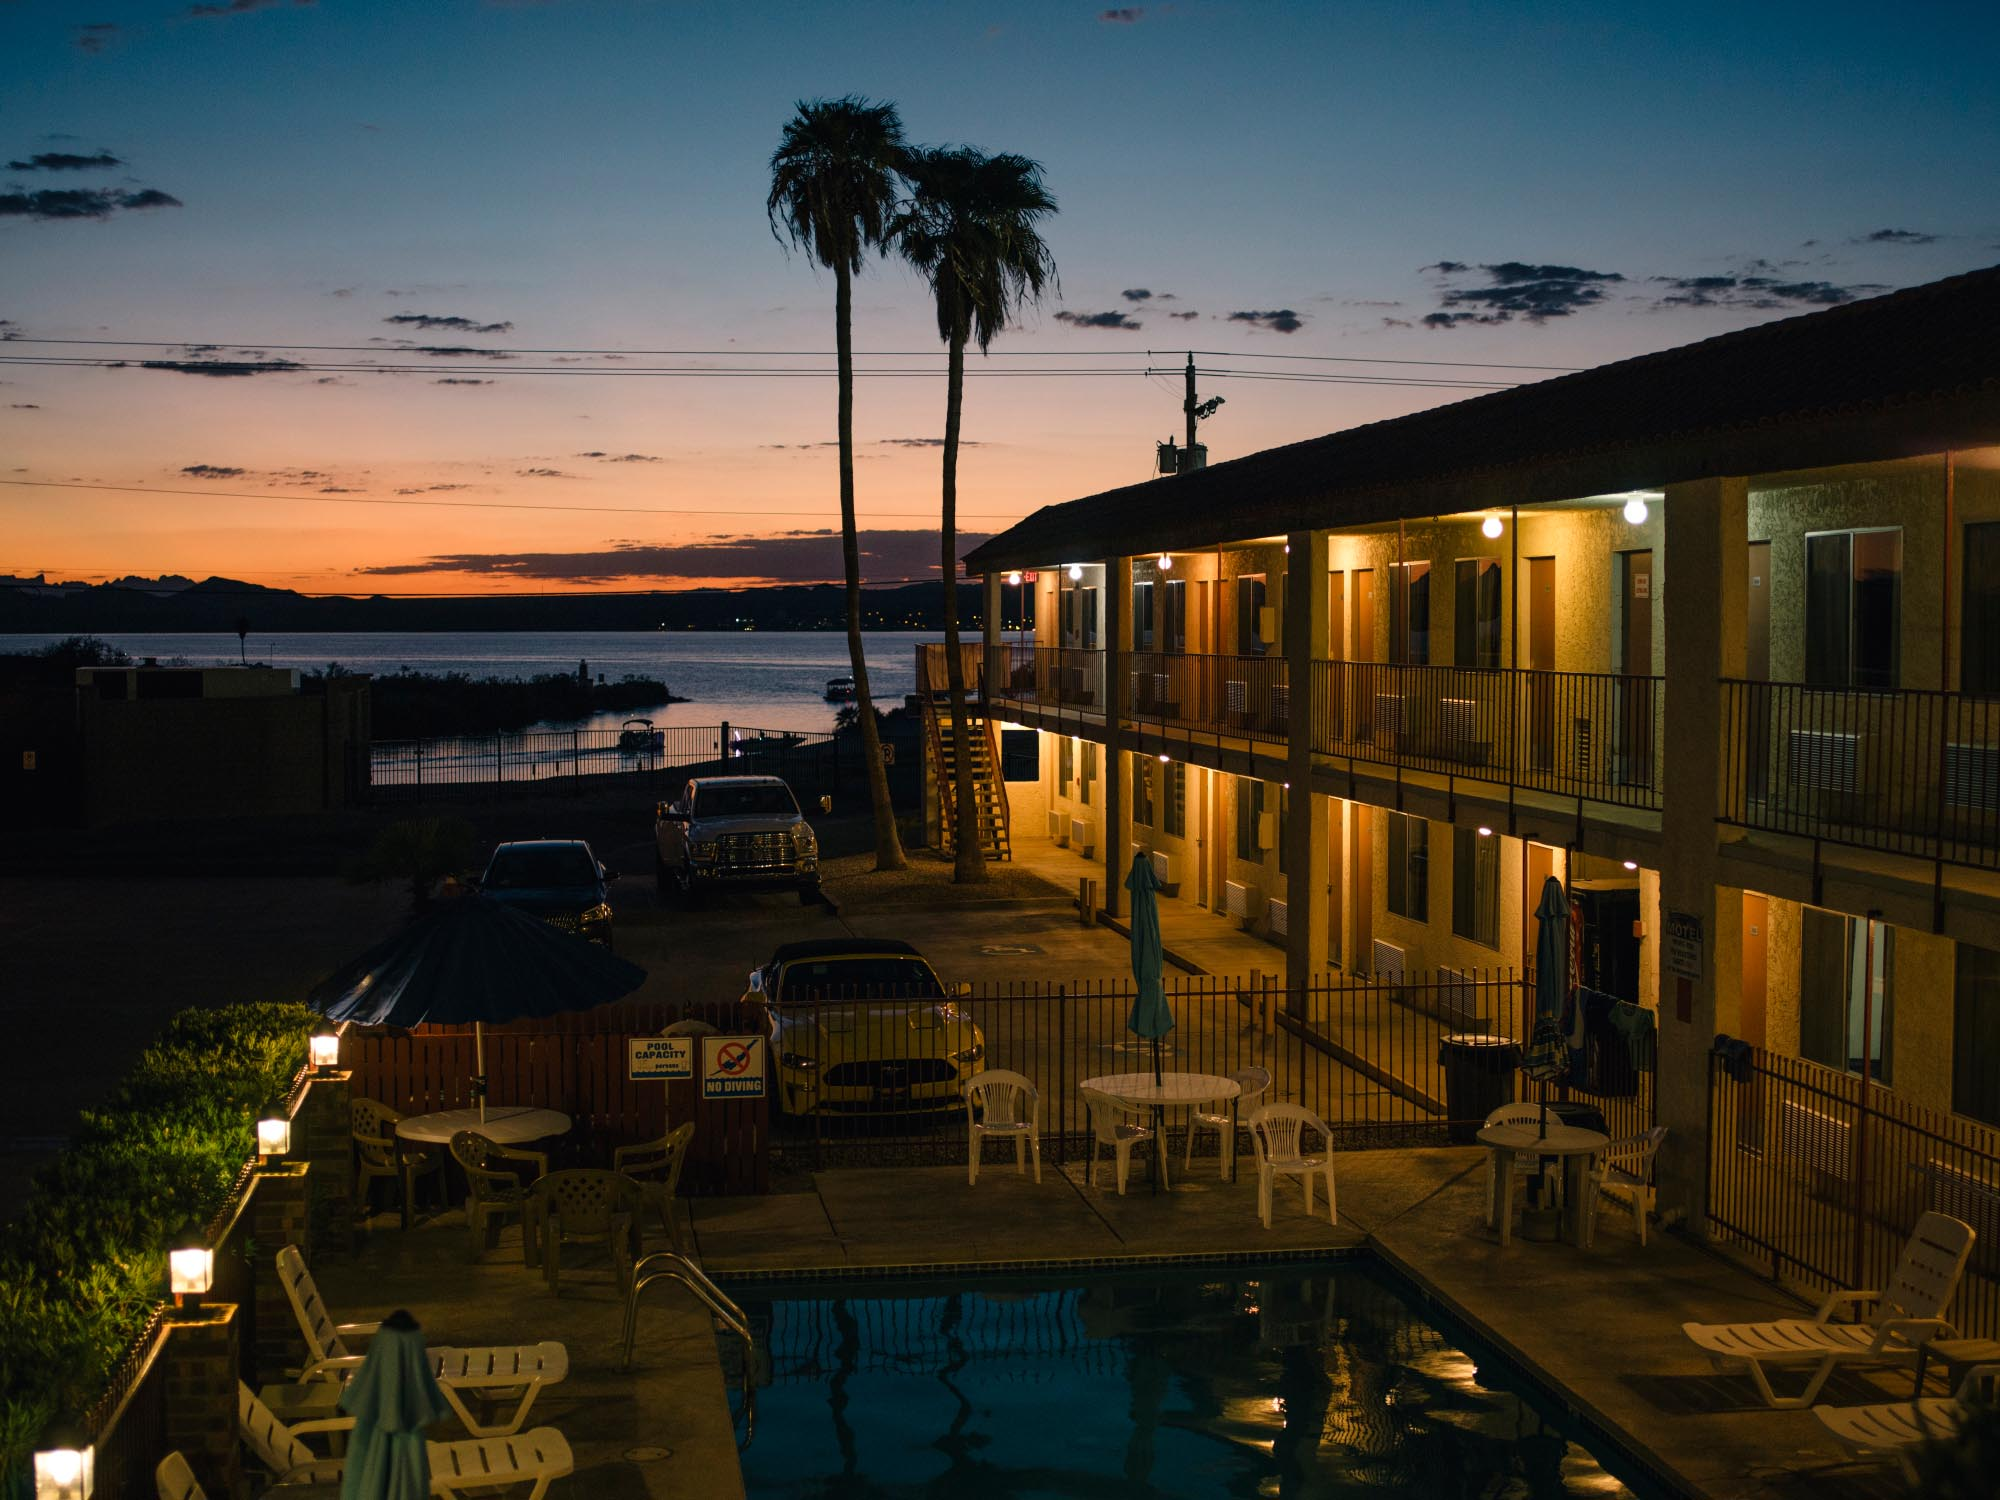 Our motel in Lake Havasu City, USA.